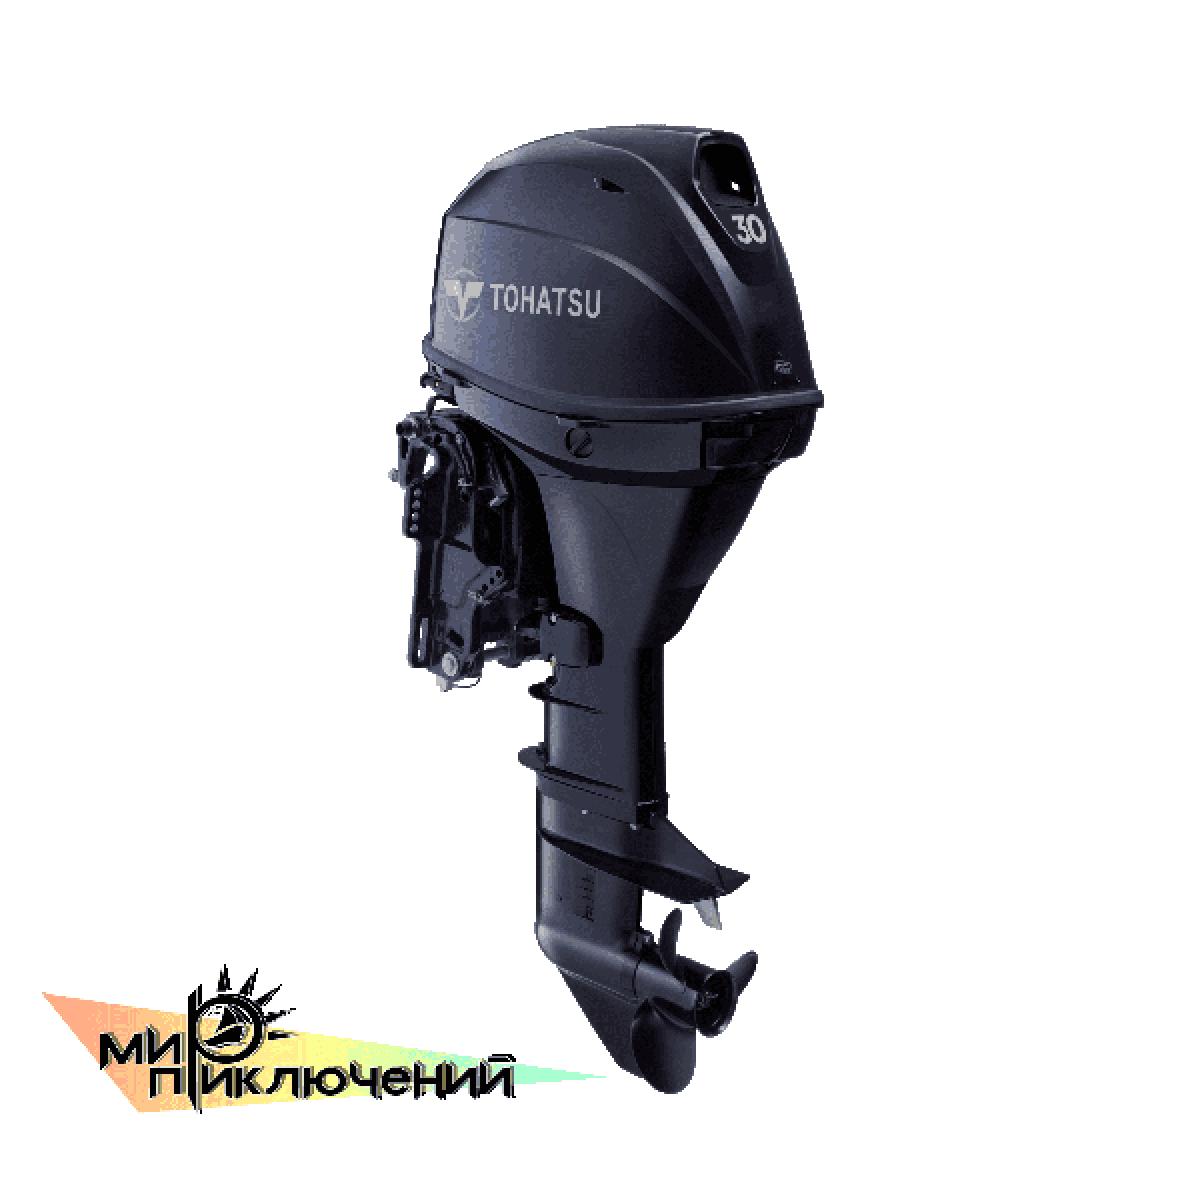 Tohatsu MFS 30 EPTL 4 х тактный подвесной лодочный мотор Тохатсу 30 л с